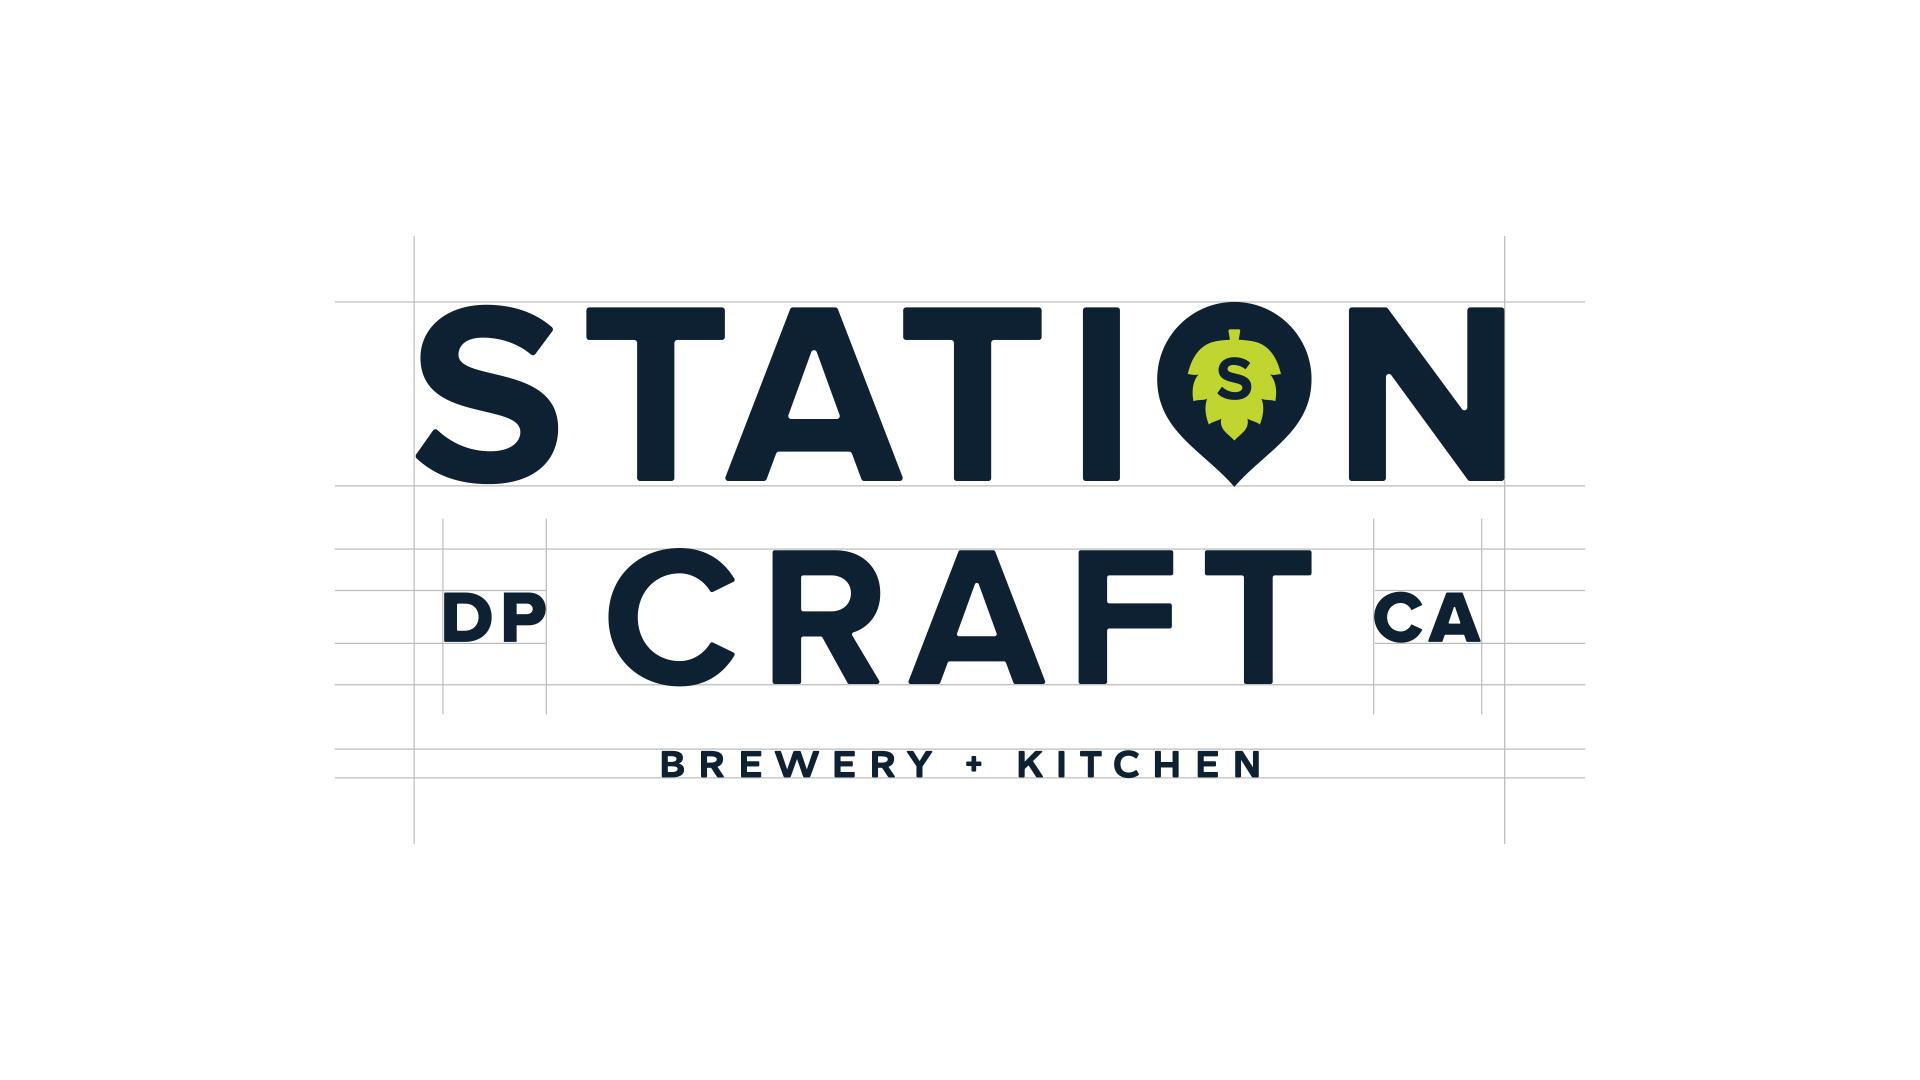 Station Craft Dana Point Logo - Unsung Studio Branding